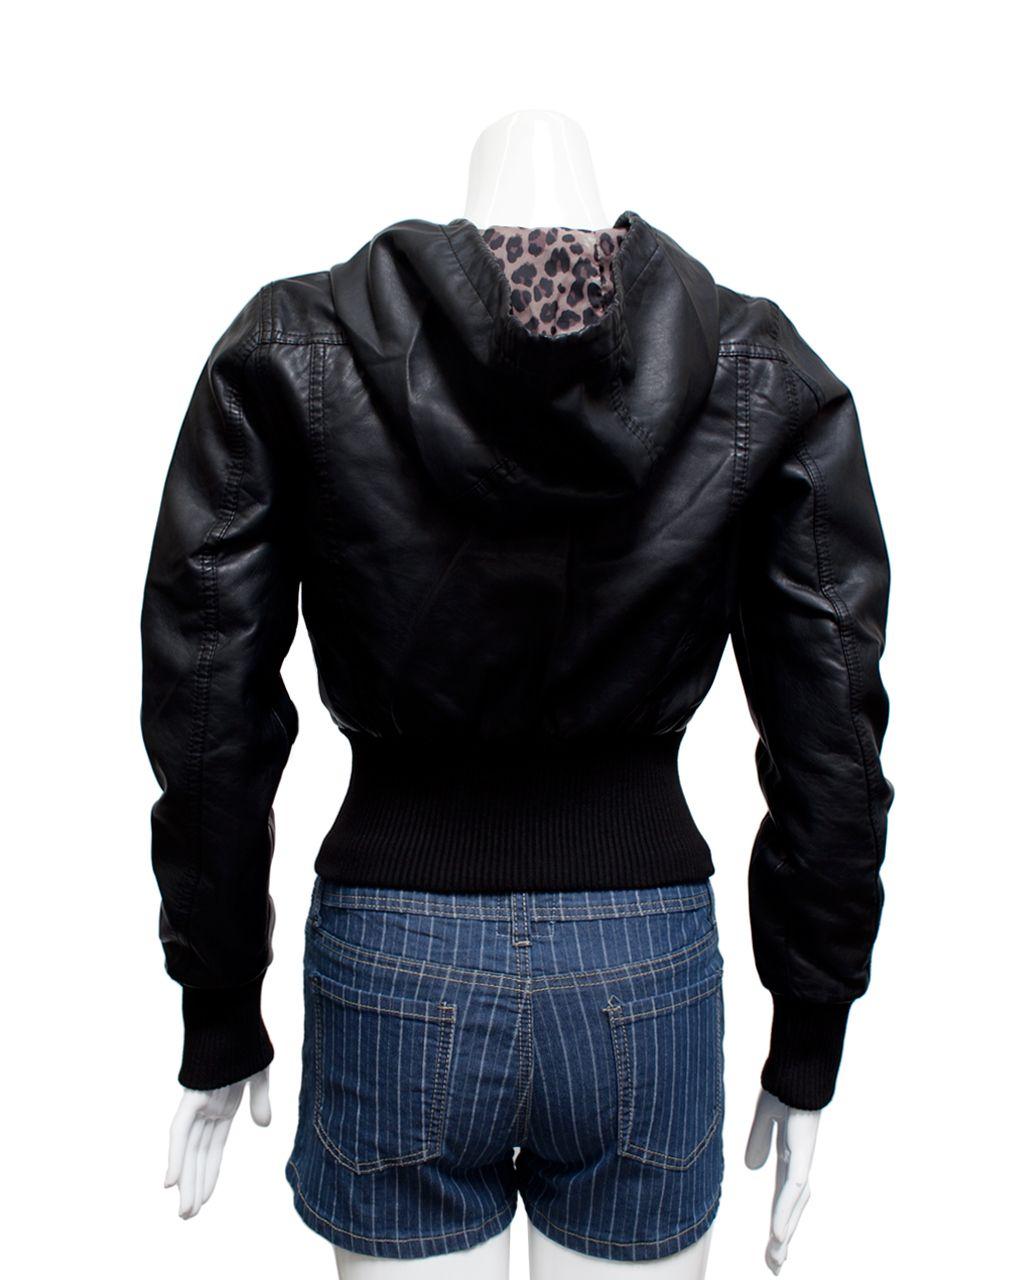 Hooded Synthetic Leather Jacket Jwpu625b Ambiance Hooded Synthetic